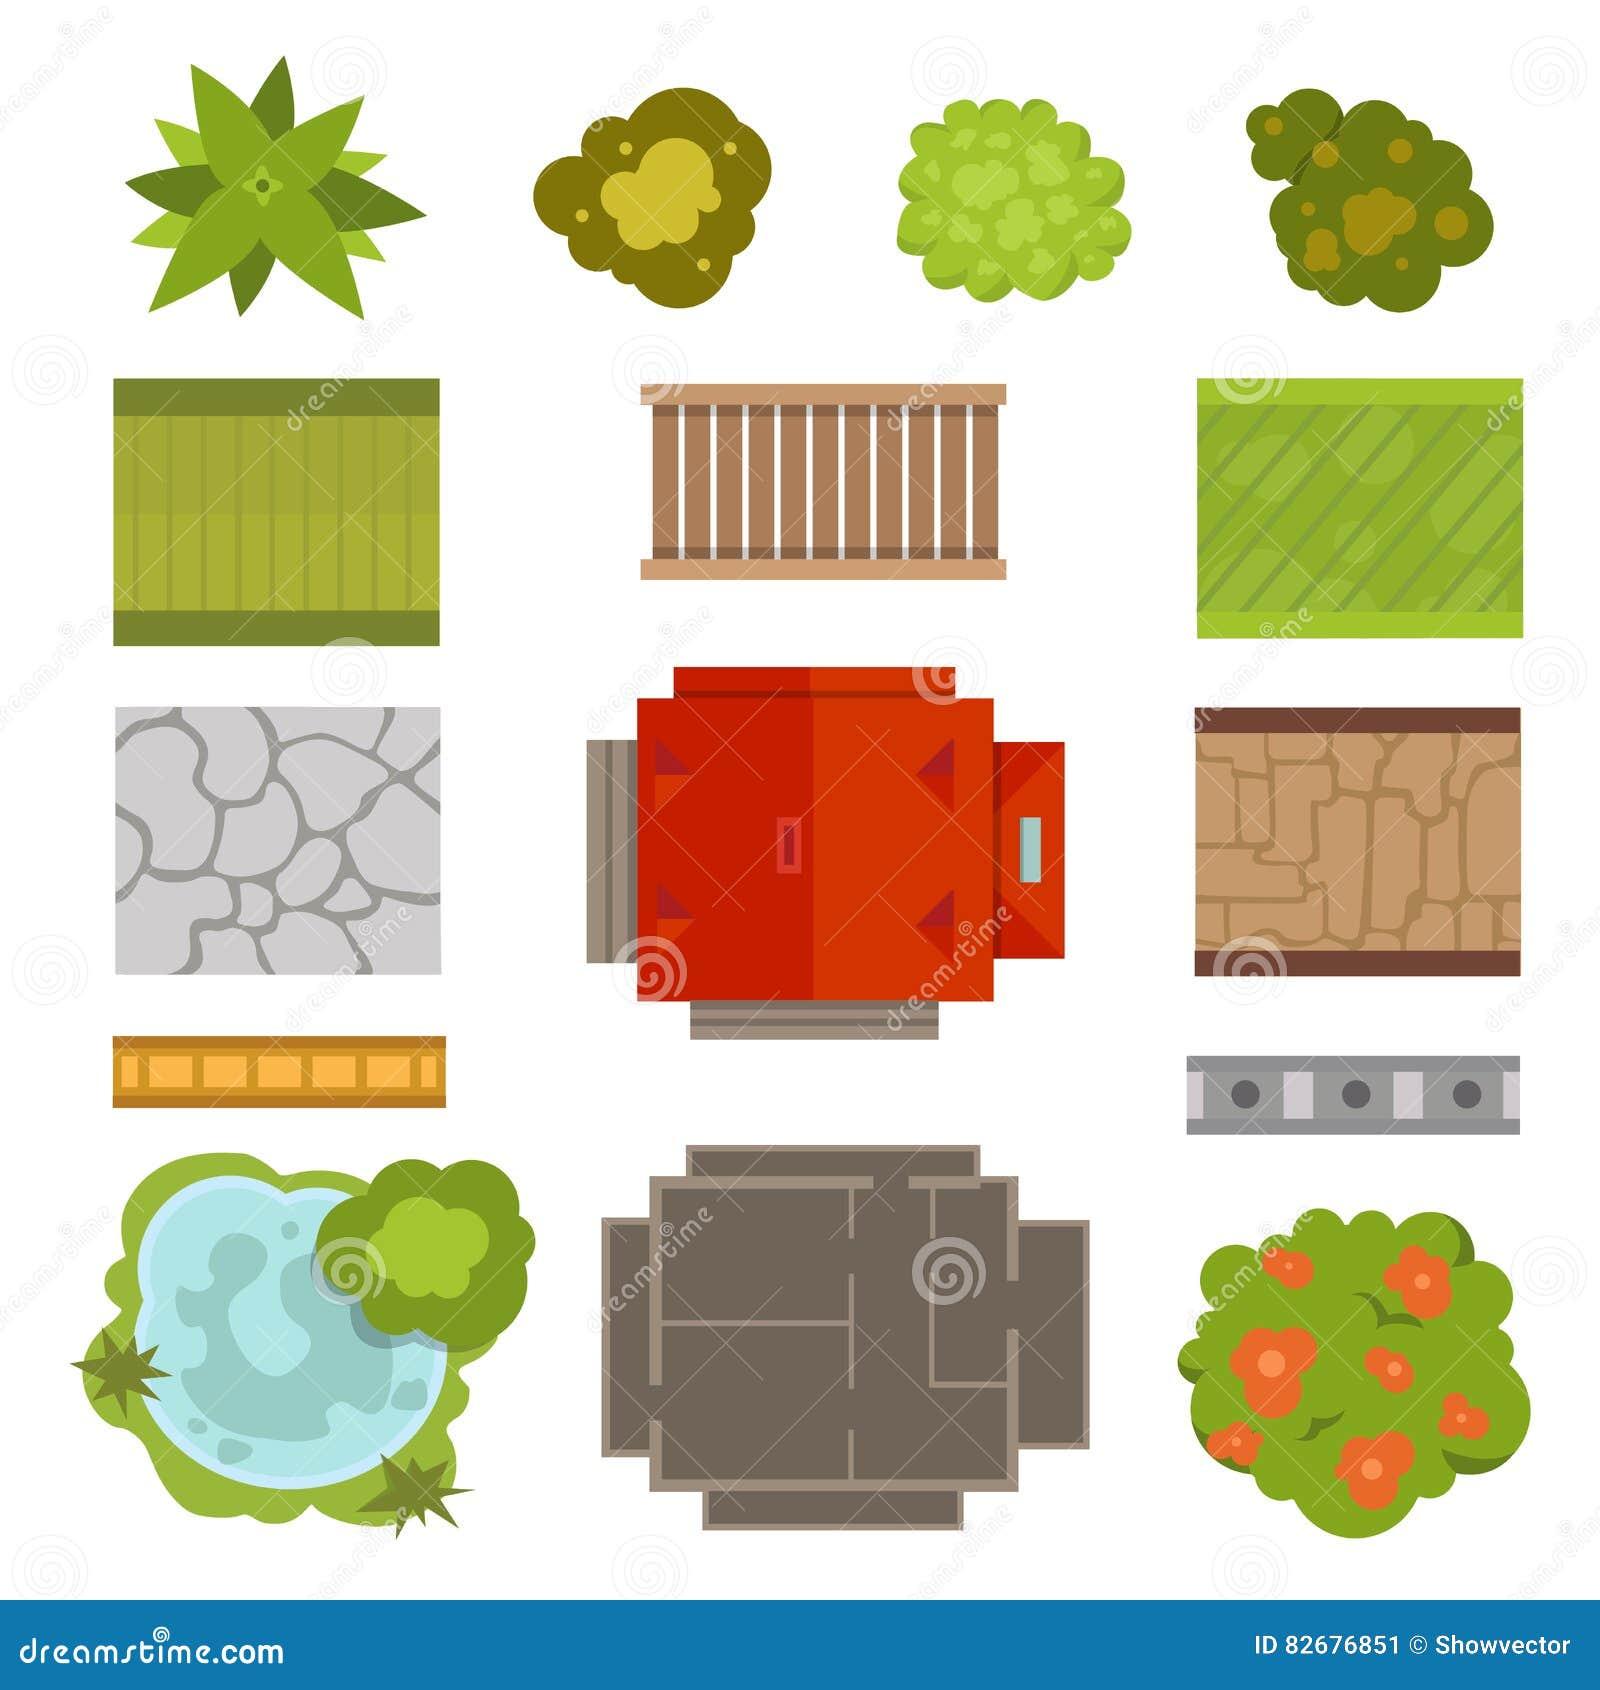 Garden chair top view - Landscape Design Constructor Vector Set Stock Image